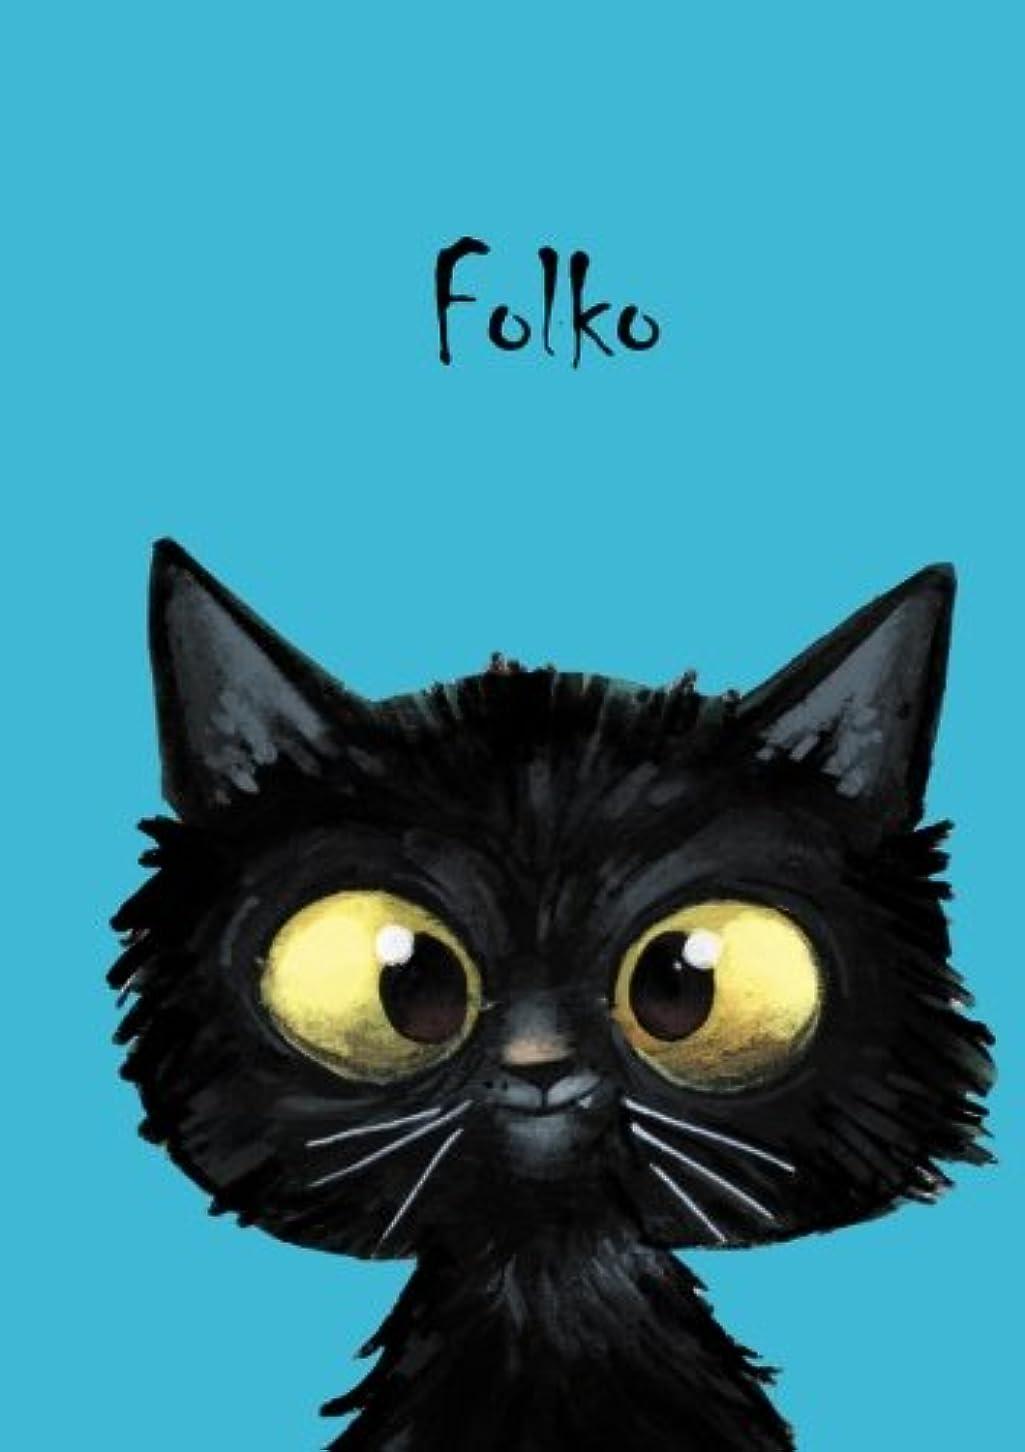 追加のぞき穴小川Folko: Personalisiertes Notizbuch, DIN A5, 80 blanko Seiten mit kleiner Katze auf jeder rechten unteren Seite. Durch Vornamen auf dem Cover, eine schoene kleine Aufmerksamkeit fuer Katzenfreunde. Mattes, handschmeichelndes Coverfinish. Ueber 2500 Namen bereits verf